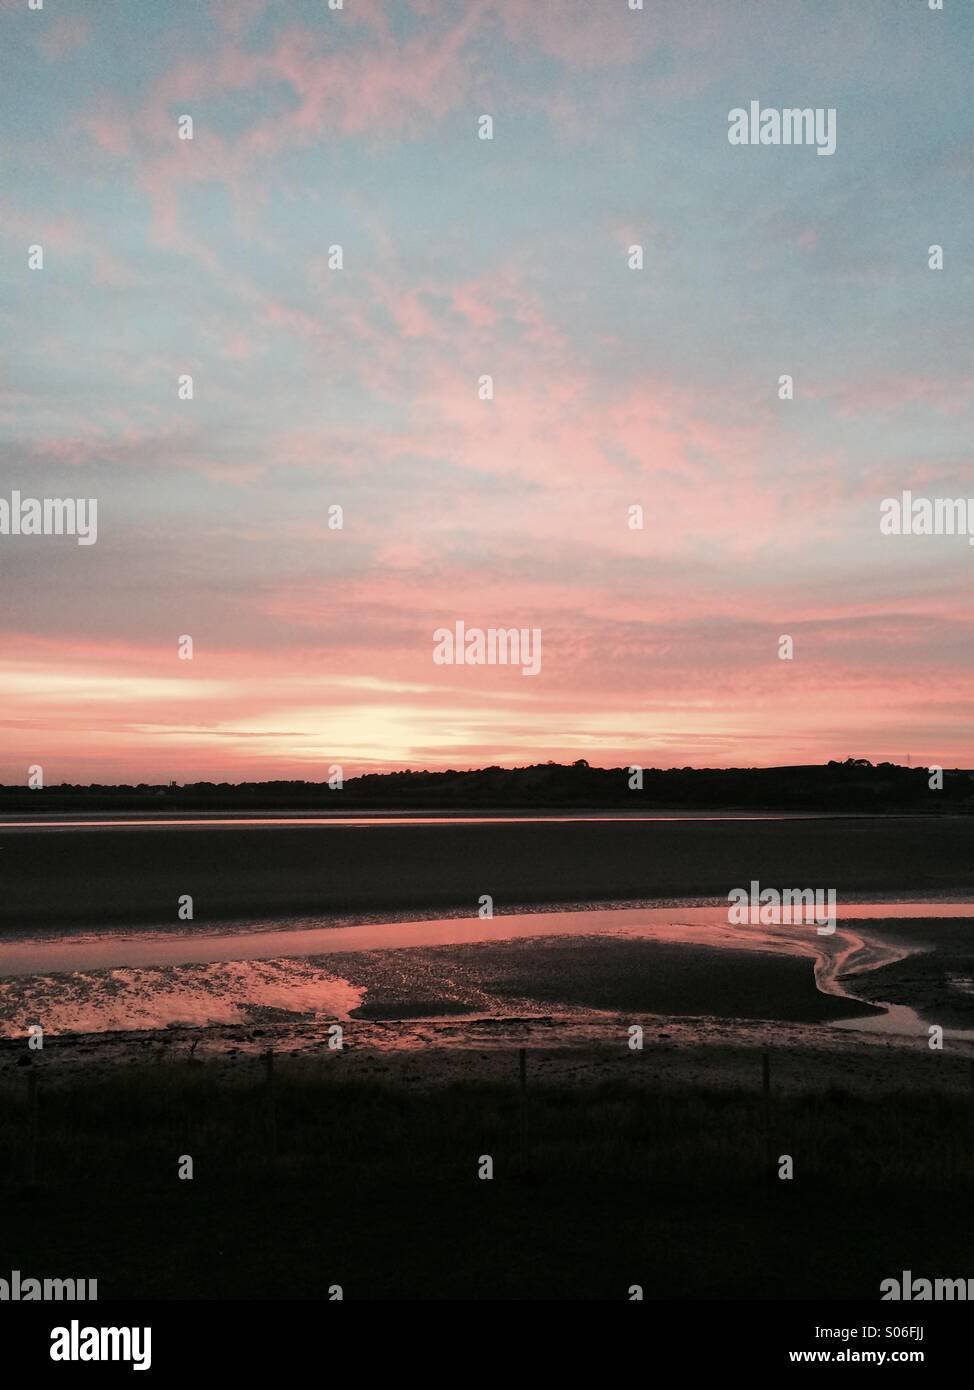 Loughor estuary. Not edited! Stock Photo